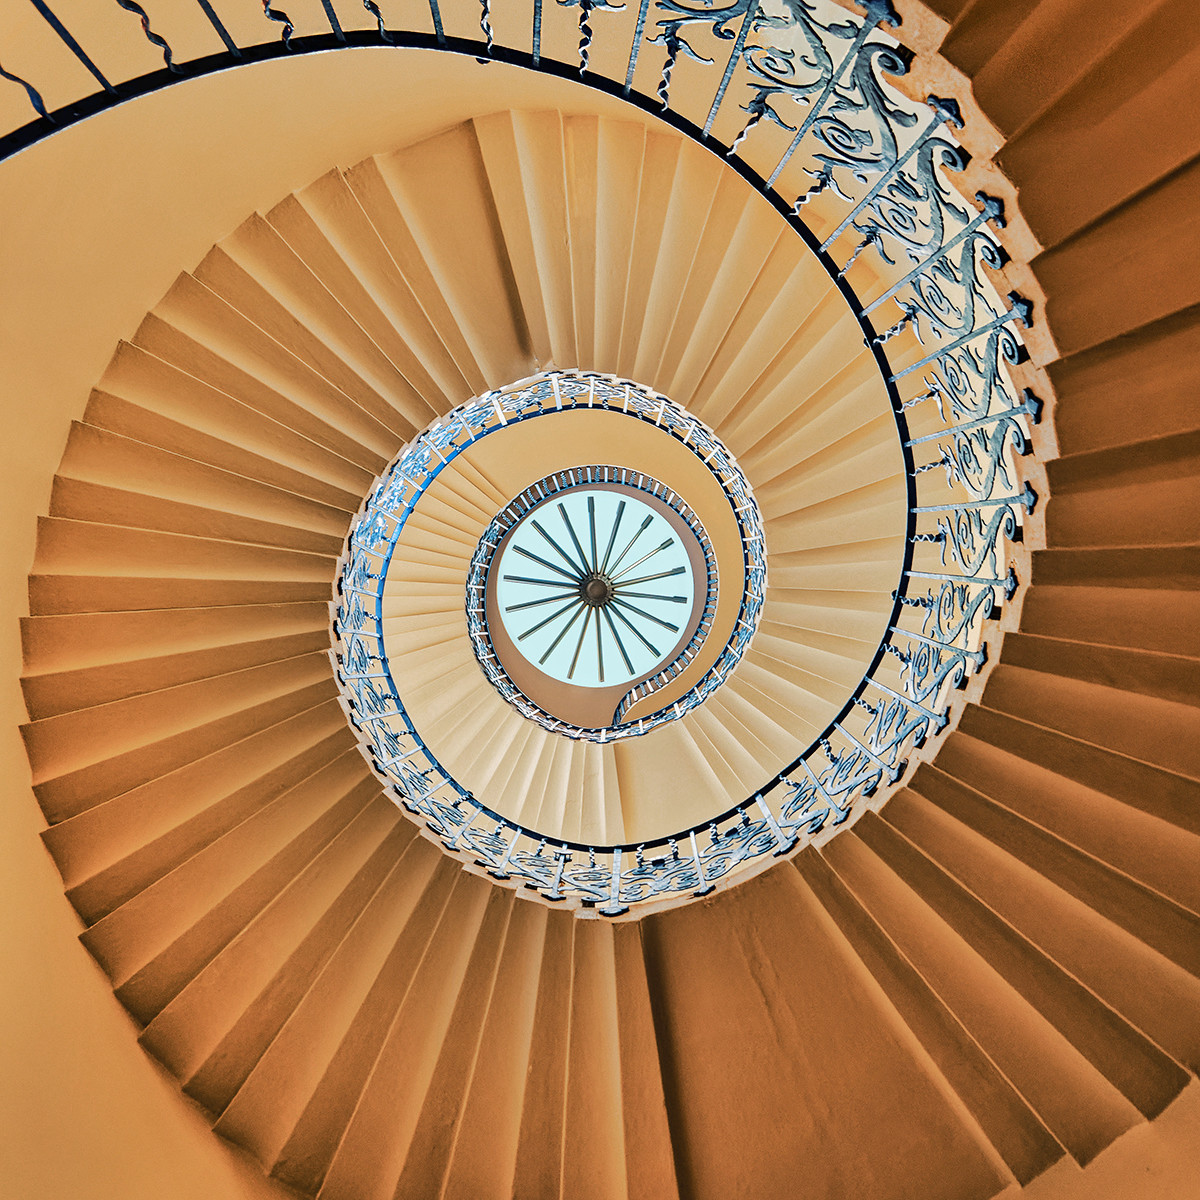 PDI - Tulip Stairs by William Allen (11 marks)